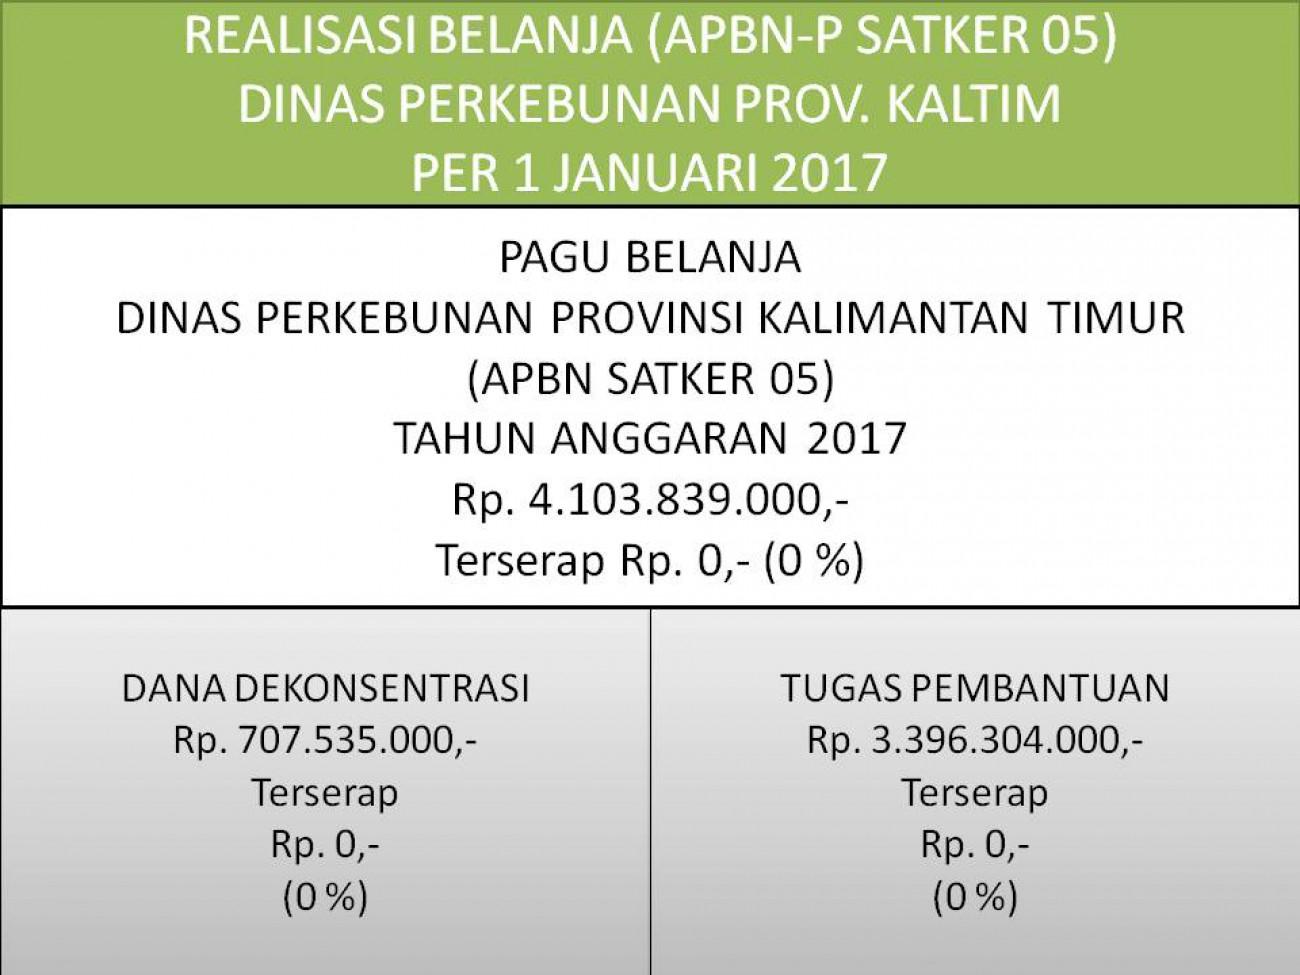 Laporan Realisasi APBN Satker 05 (Direktorat Jenderal Perkebunan) Dinas Perkebunan Prov. Kaltim Per 31 Januari 2017